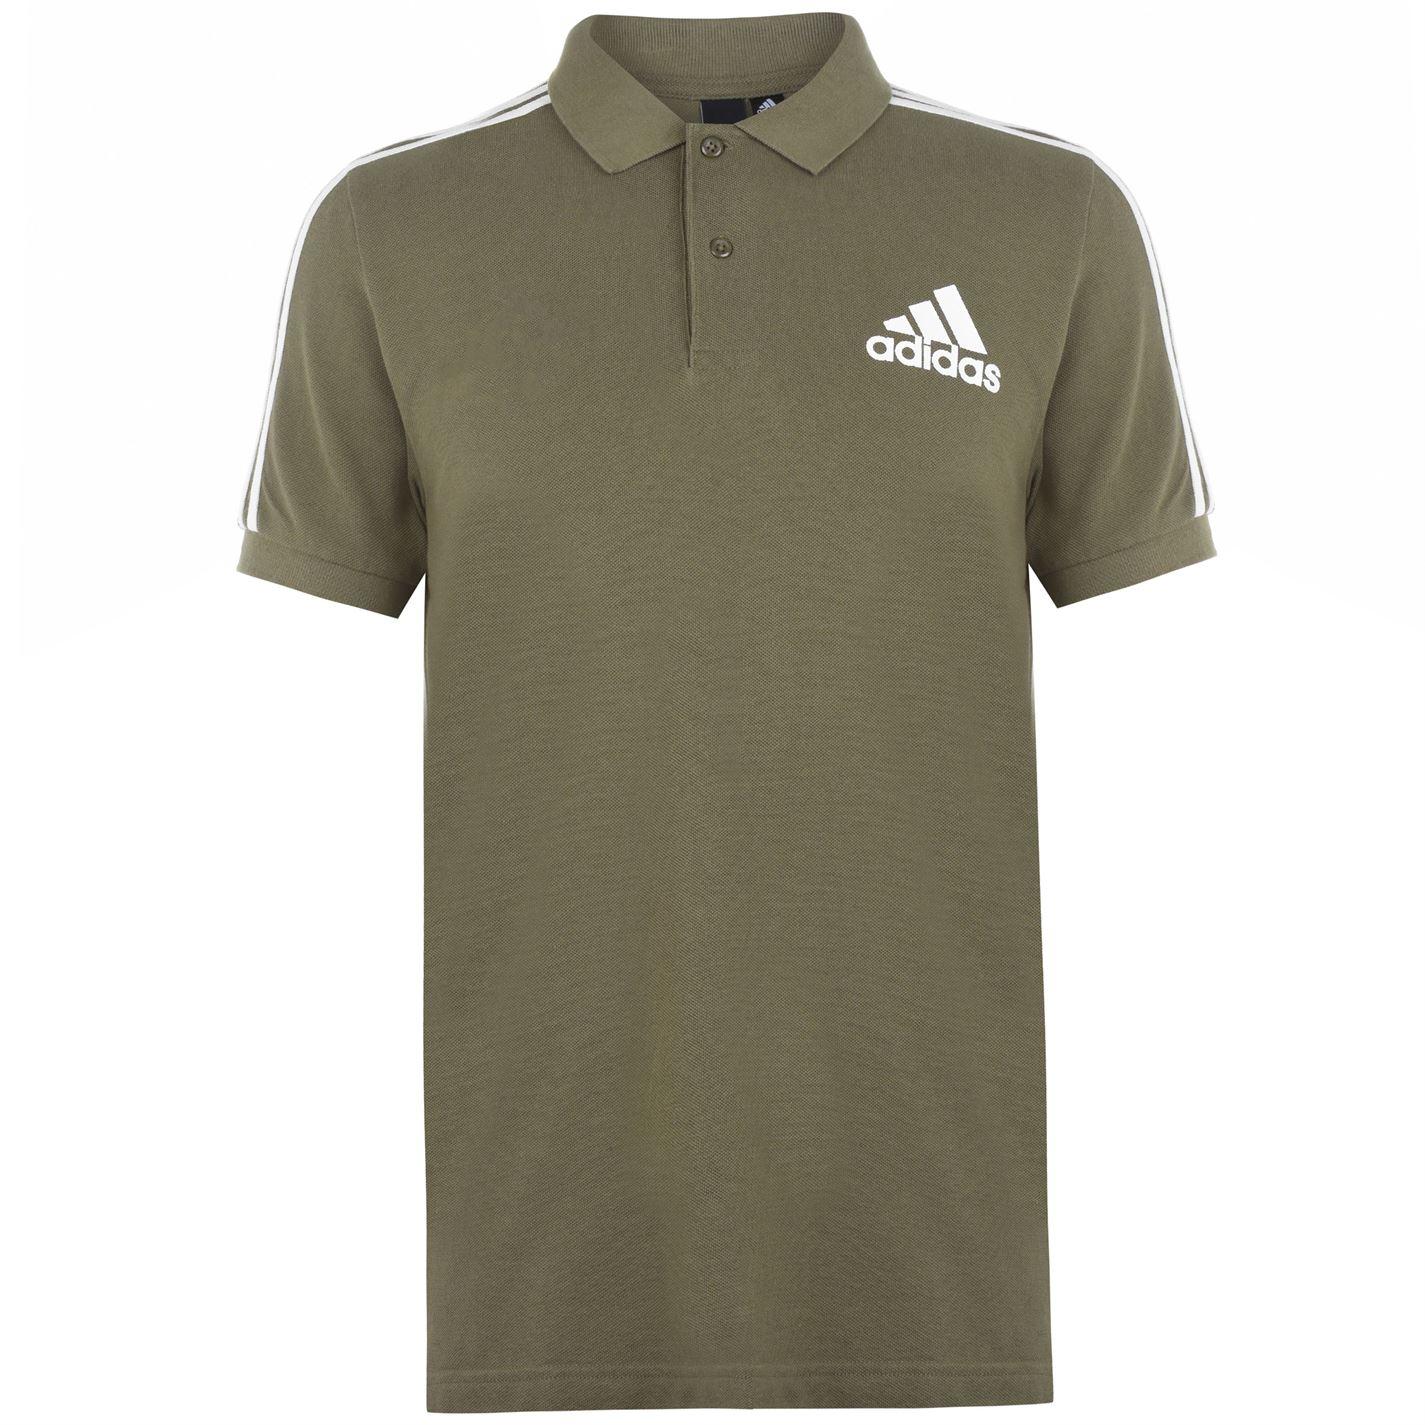 Adidas 3 Stripes Logo Polo Shirt Mens